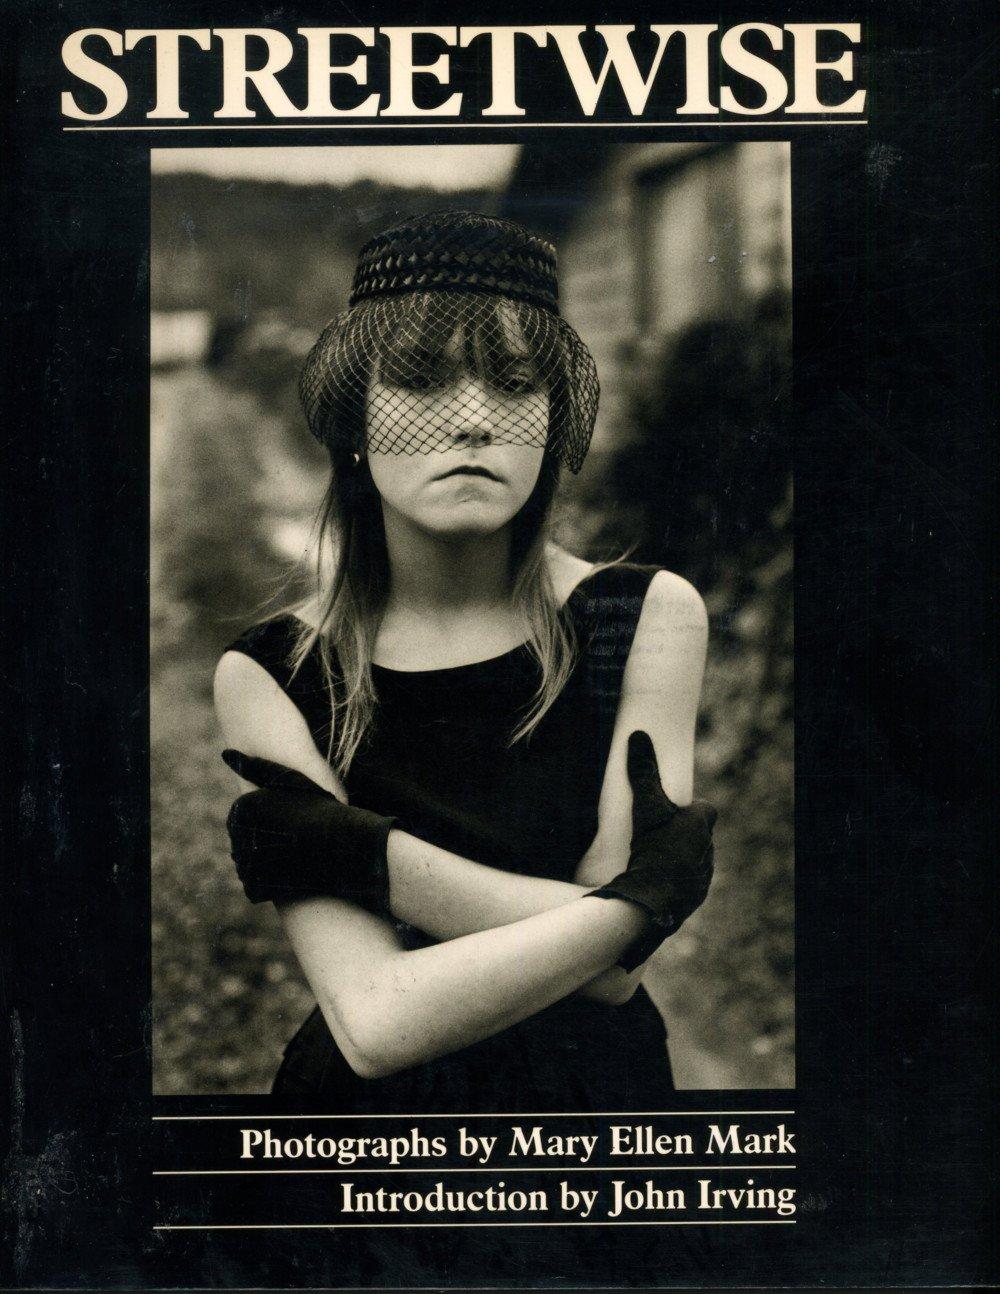 Mary_Ellen_Mark_Streetwise_1988_cover mary ellen mark (1940 2015) a farewell photocritic international,Mary Ellen Meme